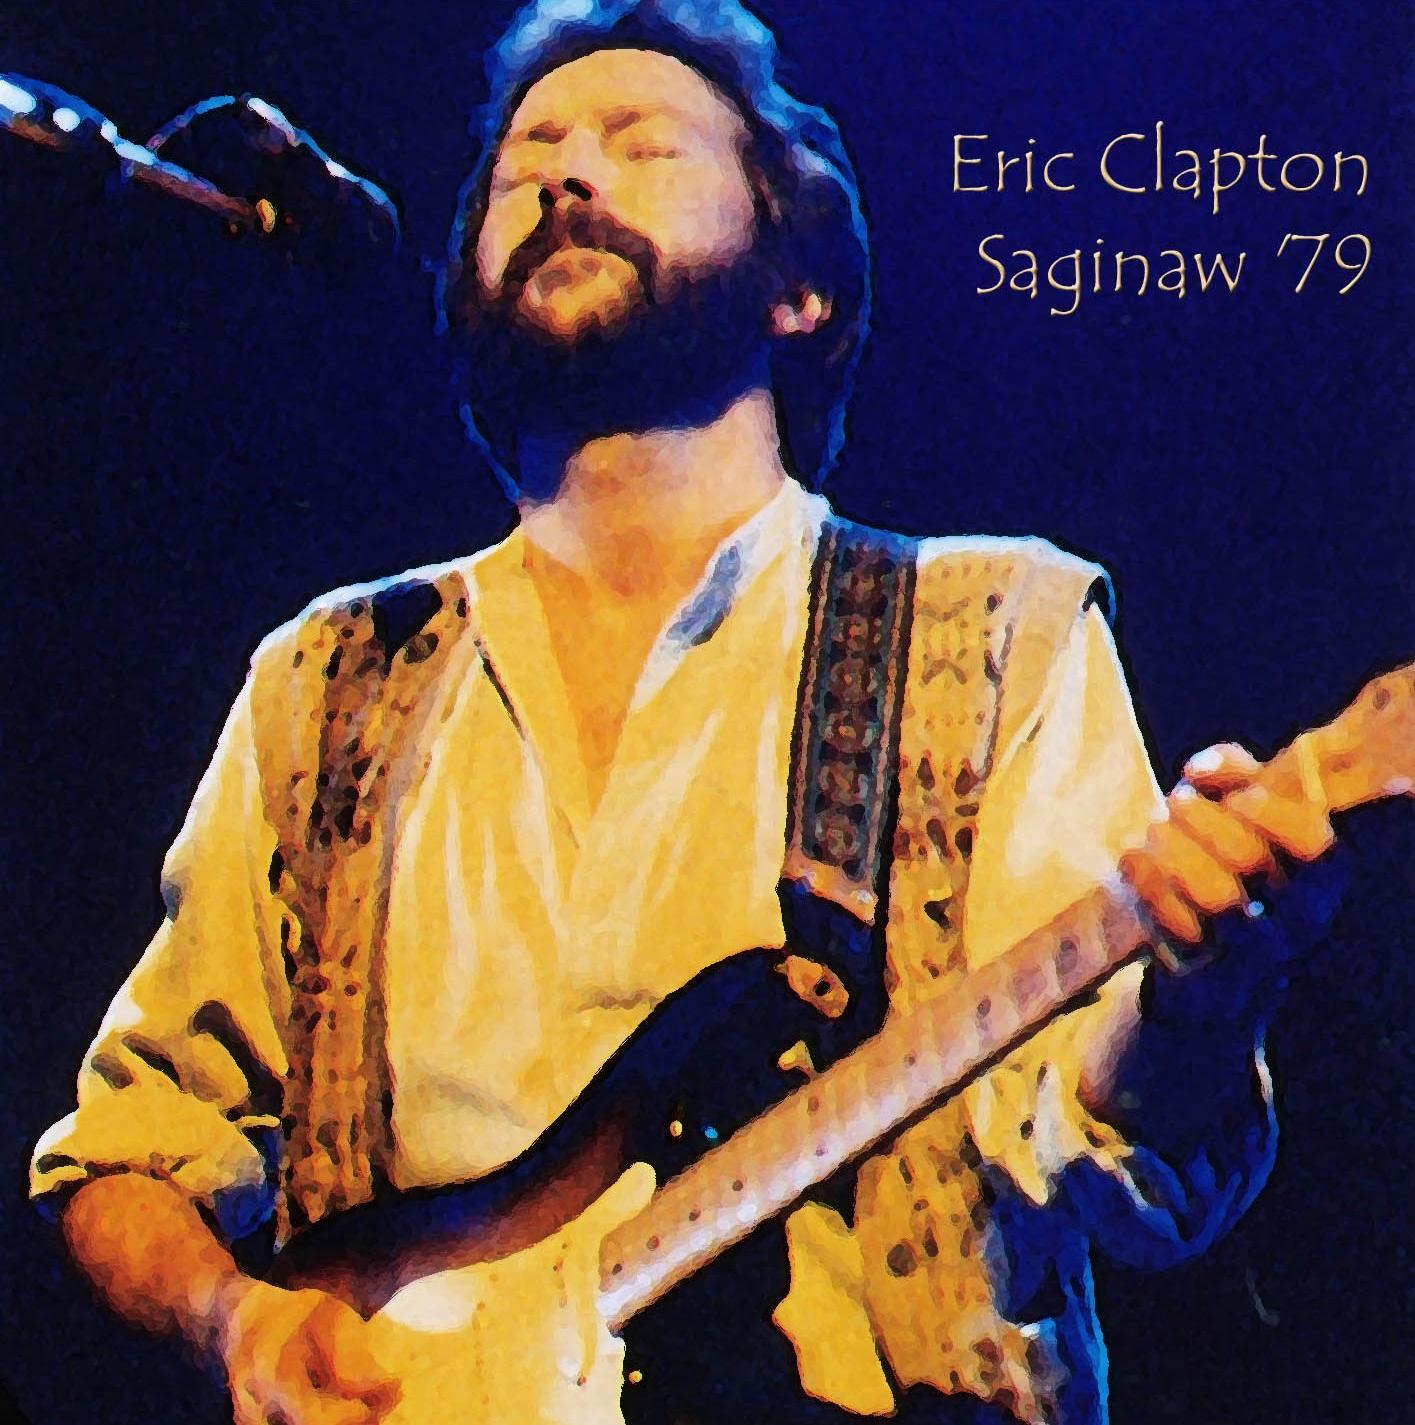 Cocaine Live Eric Clapton: Saginaw 1979